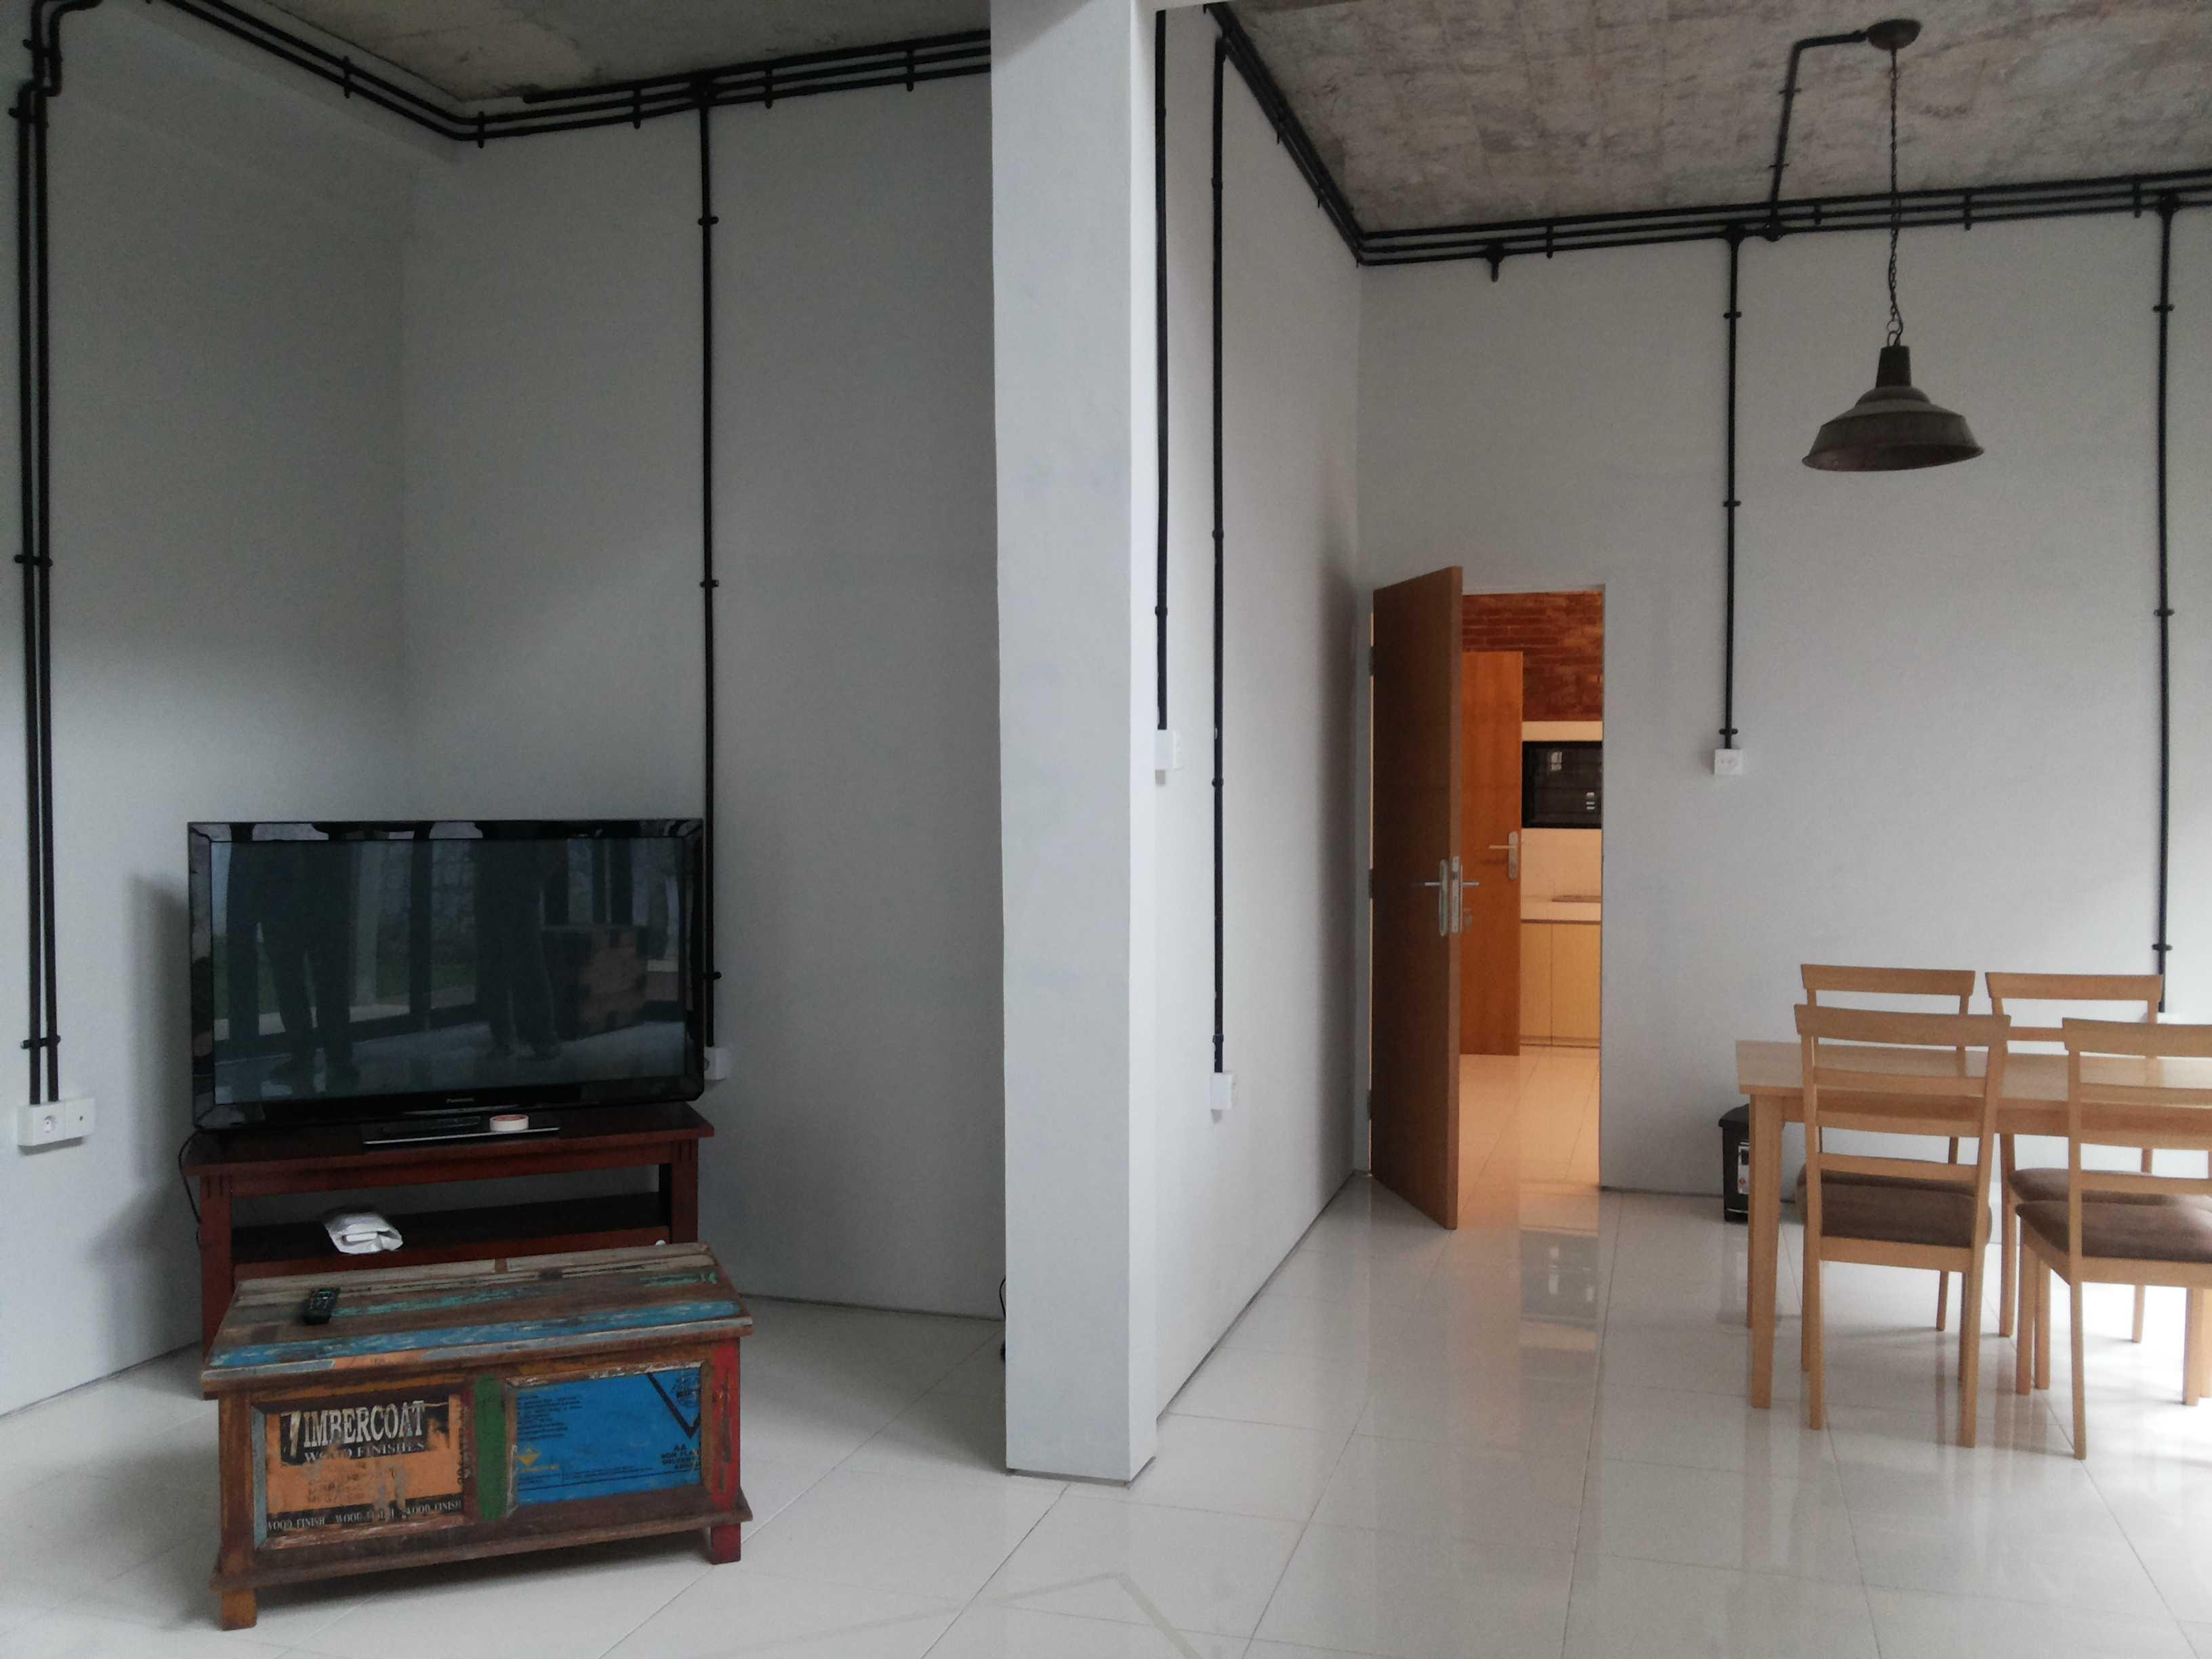 Psa Studio Delman Kencana Jakarta,  Indonesia Jakarta,  Indonesia Living-And-Dining-Area   16492